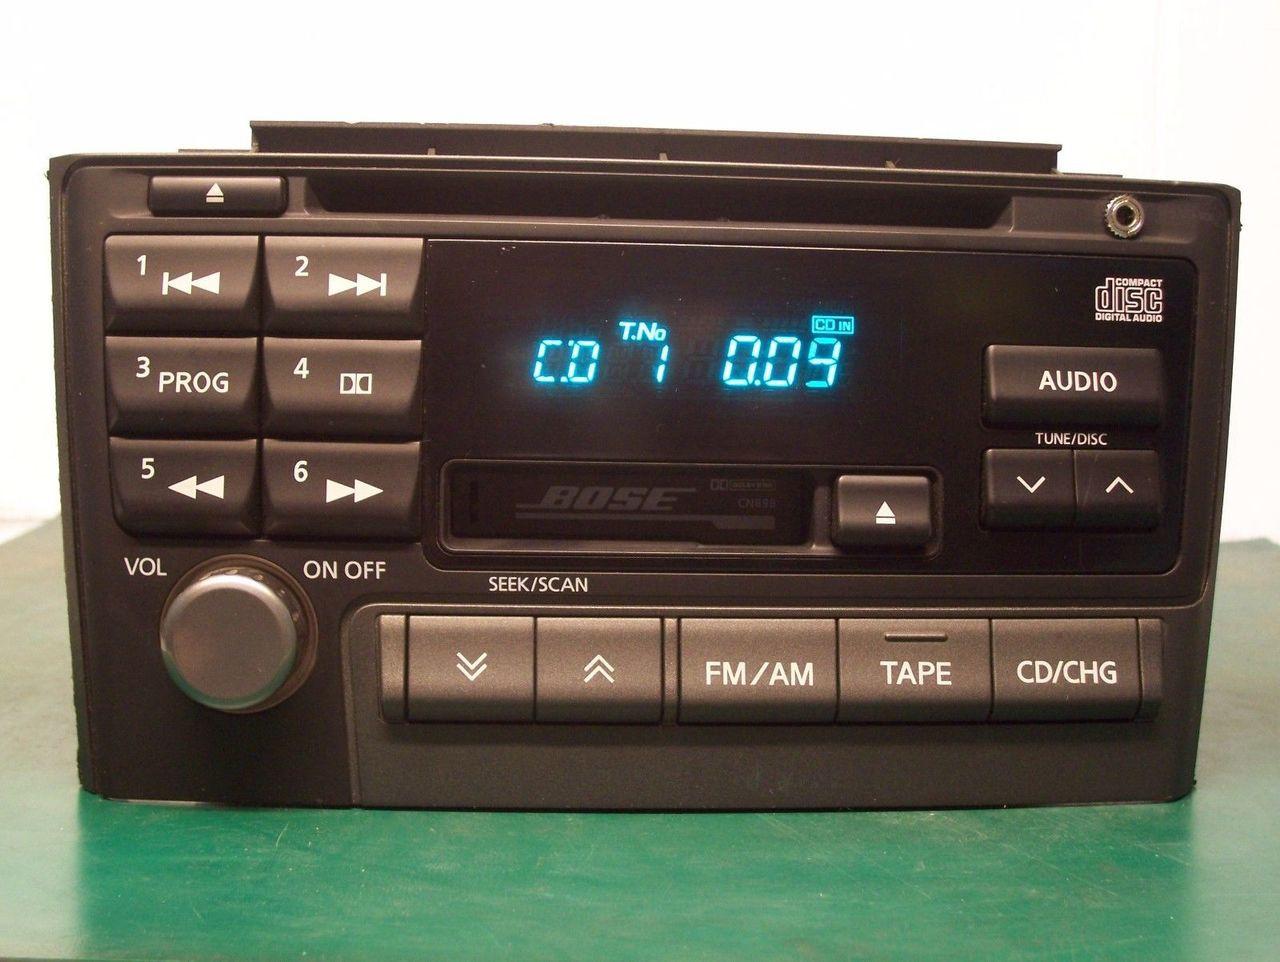 Metra Dash Kit for Select 2000-2003 Nissan Maxima w/ Bose ...  |2000 Nissan Maxima Radio Replacement